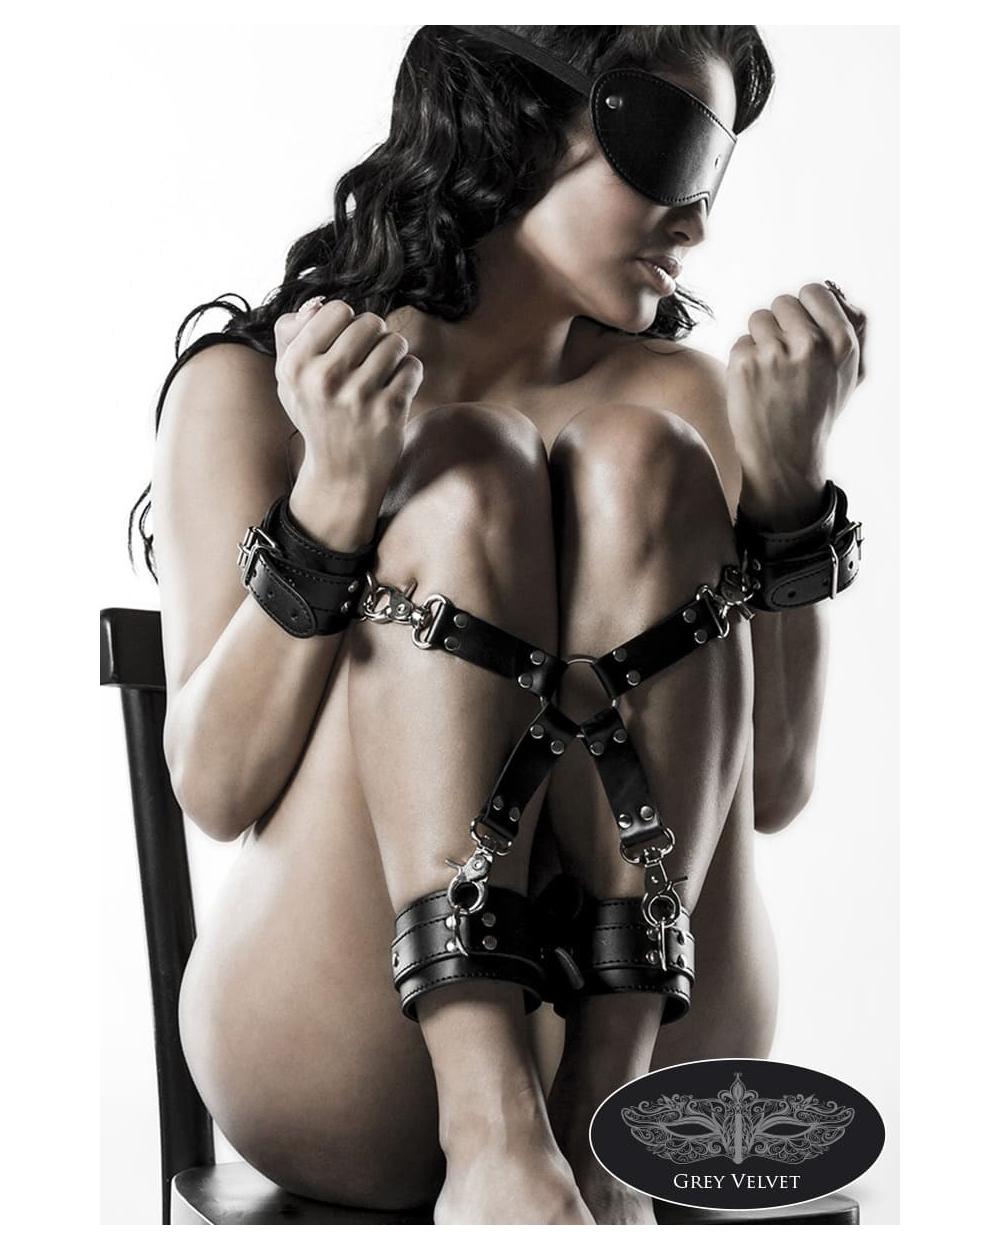 5-teiliges Bondage-Set aus Kunstleder von Grey Velvet